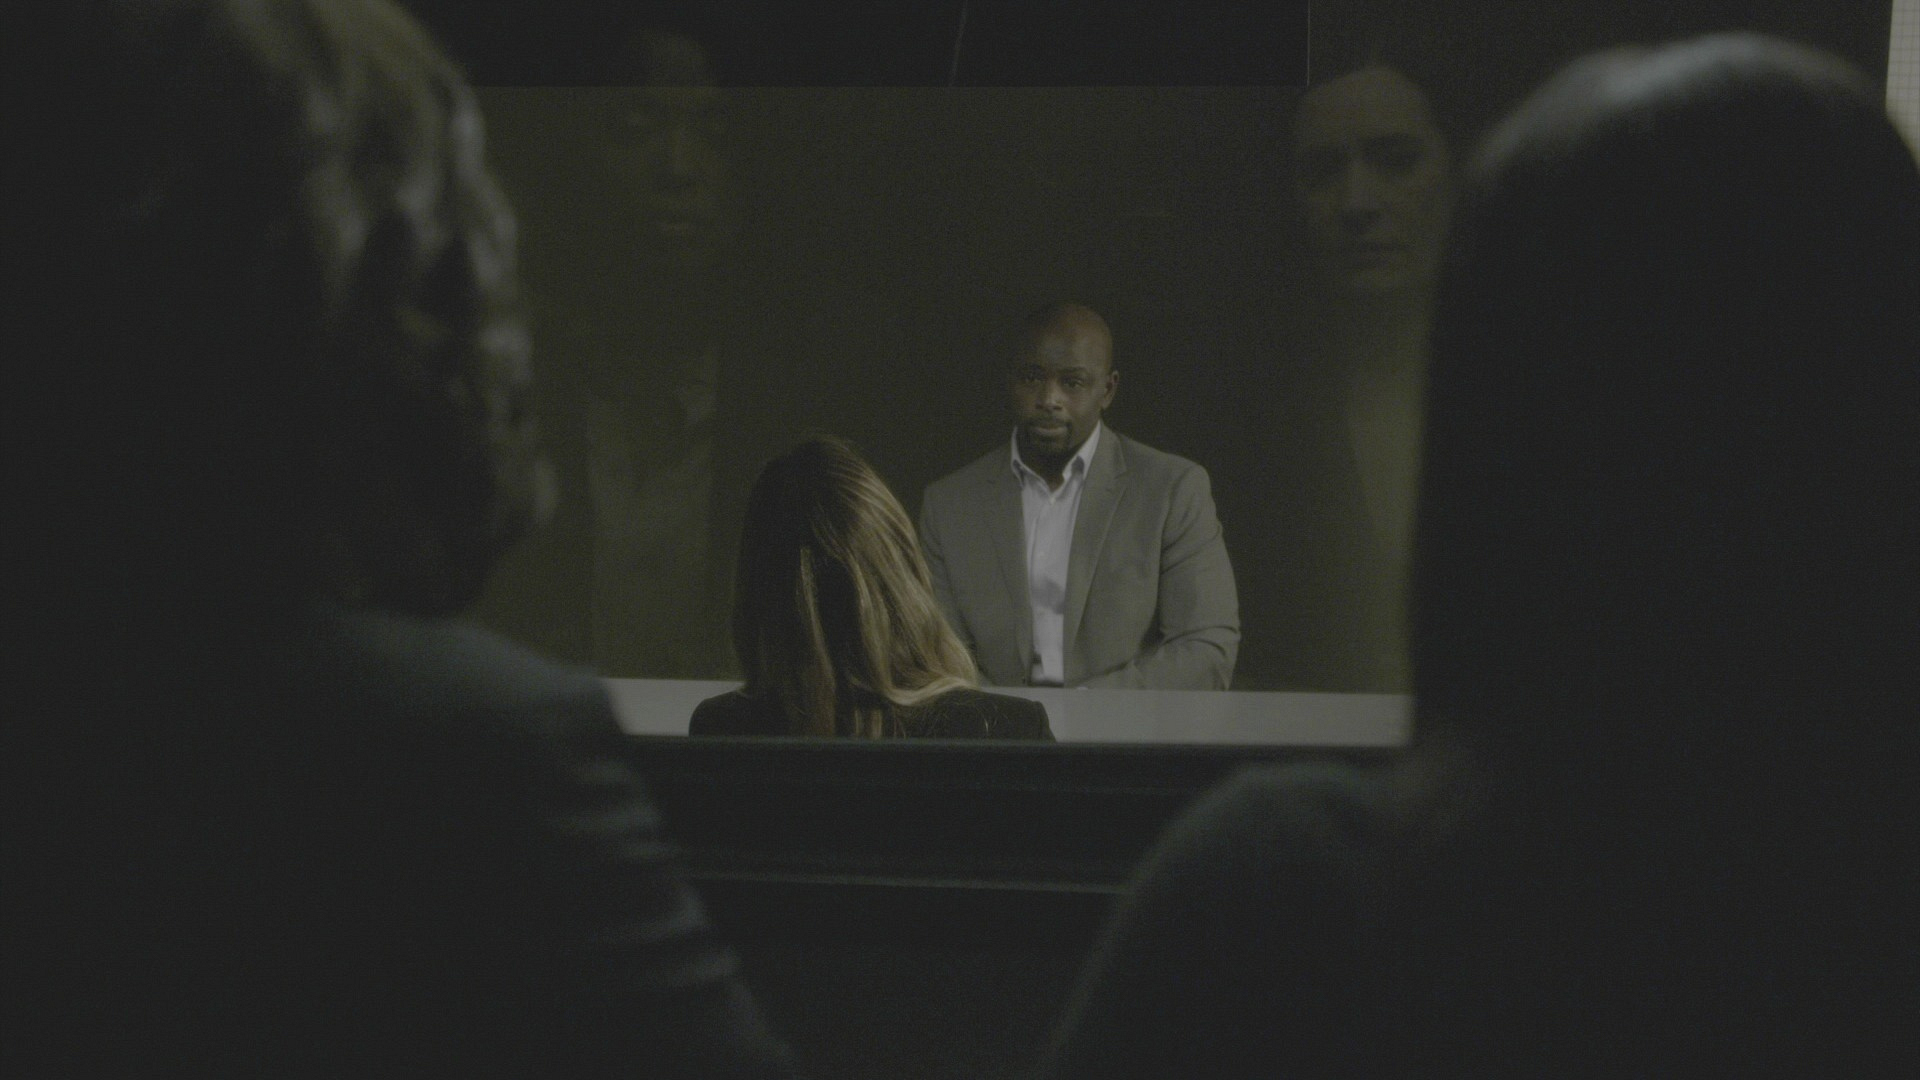 Lewis and Prentiss watch JJ's interrogation.